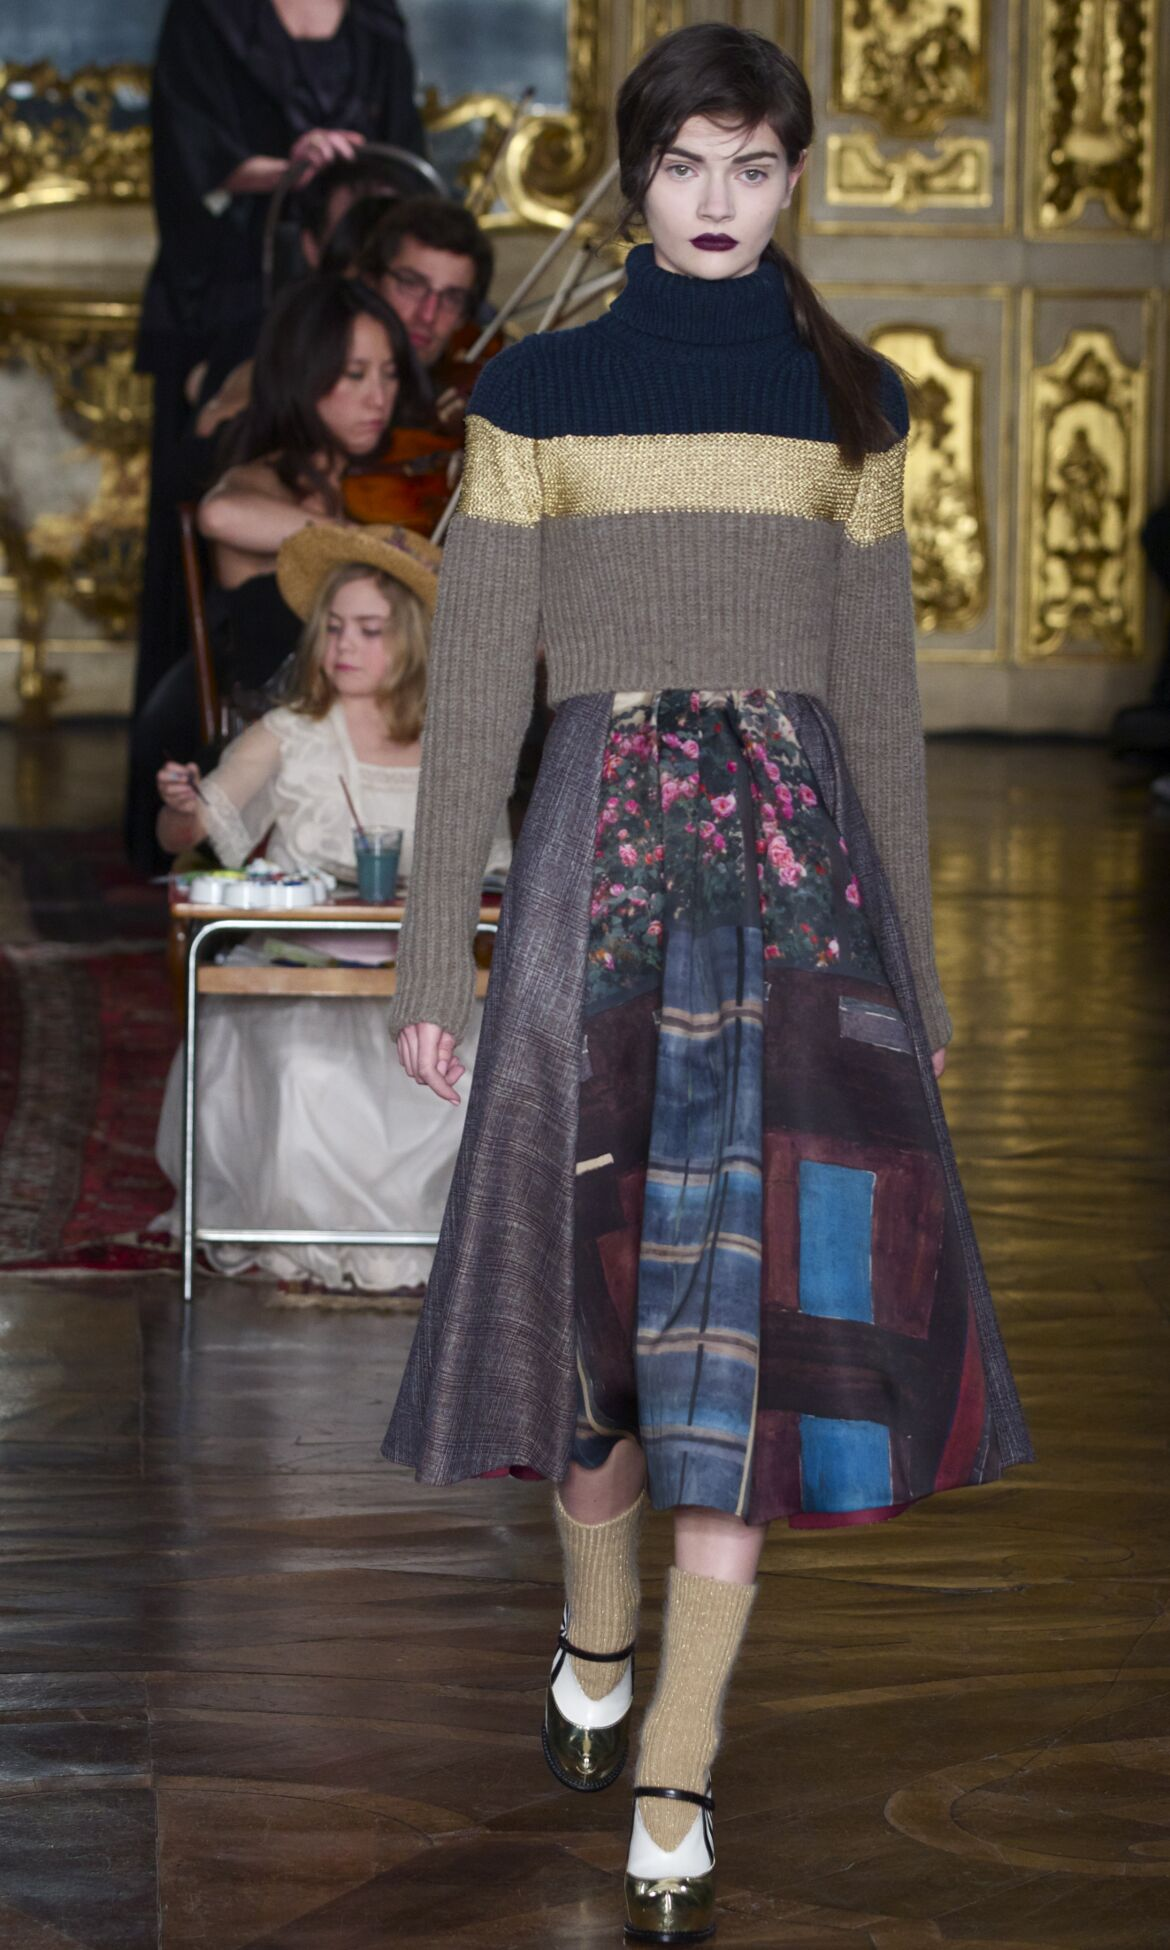 Catwalk Antonio Marras Fall Winter 2013 14 Women Collection Milan Fashion Week